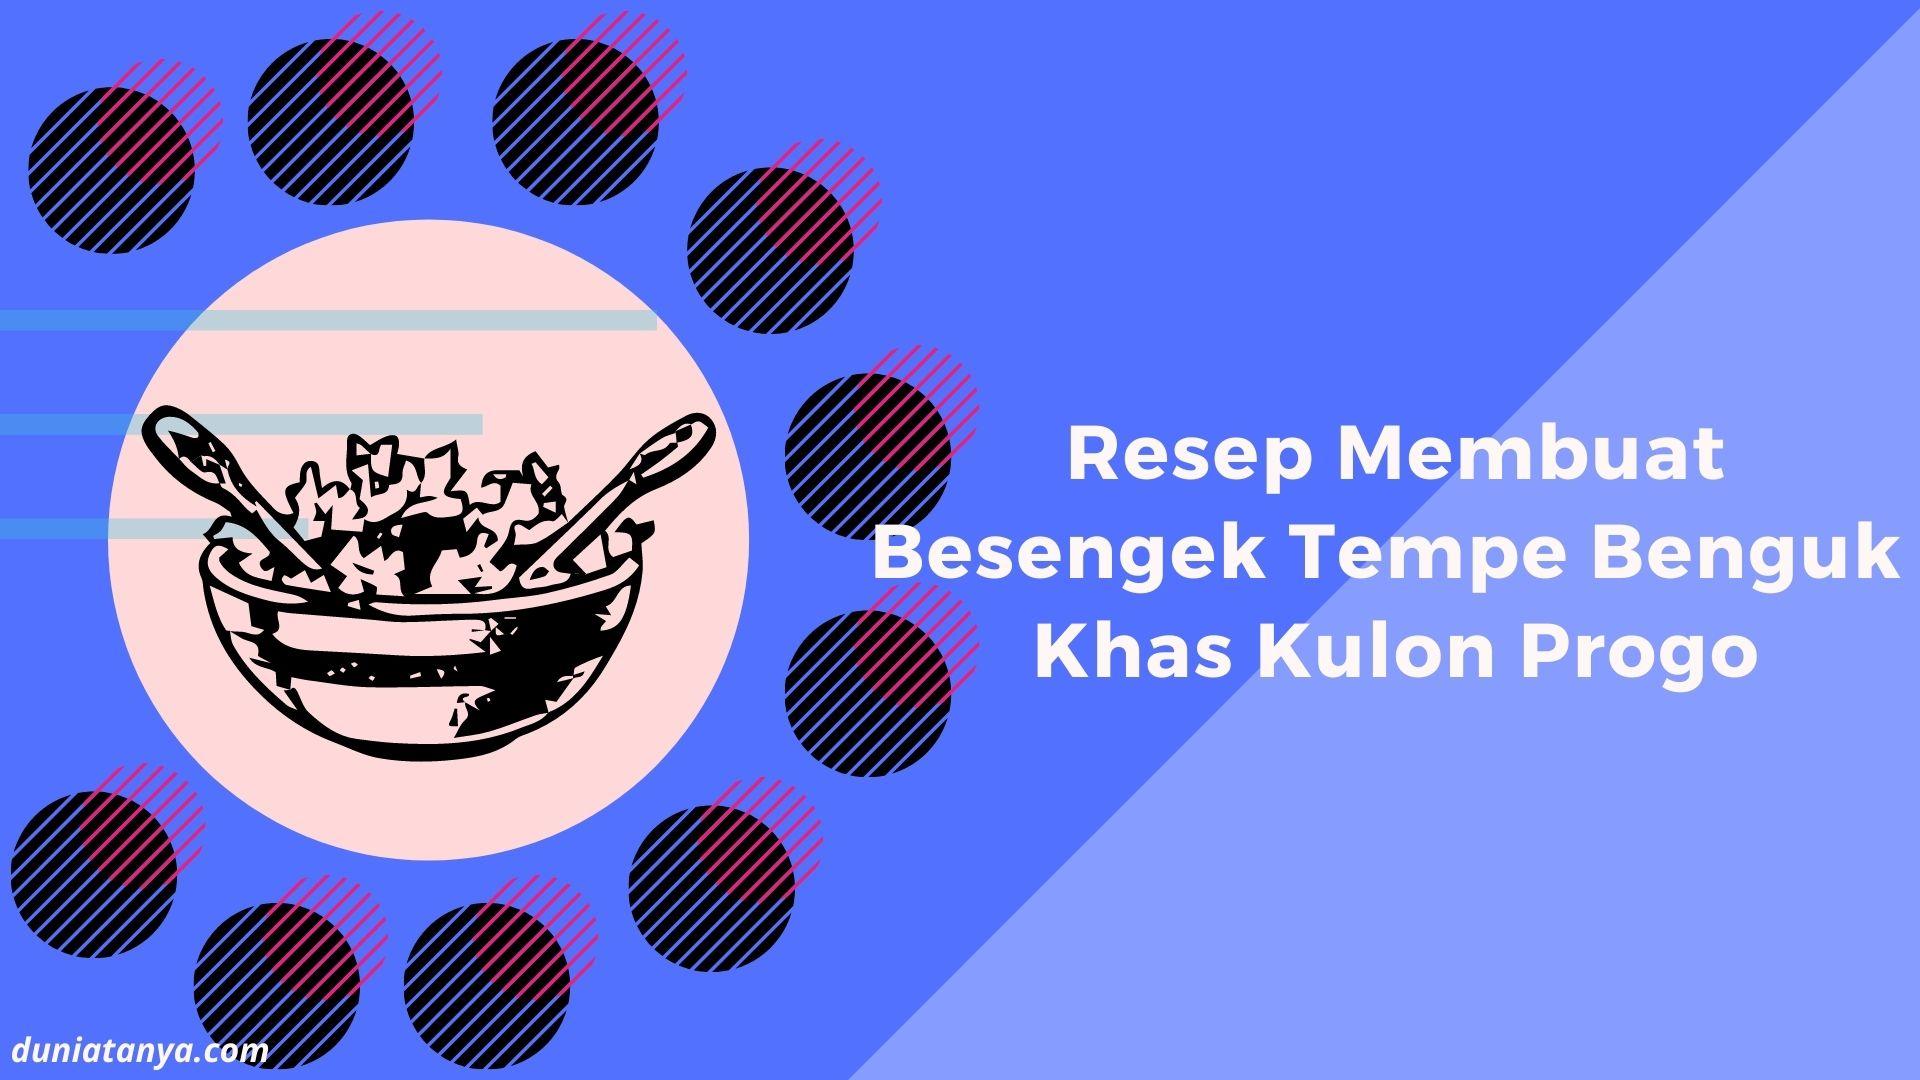 Read more about the article Resep Membuat Besengek Tempe Benguk Khas Kulon Progo